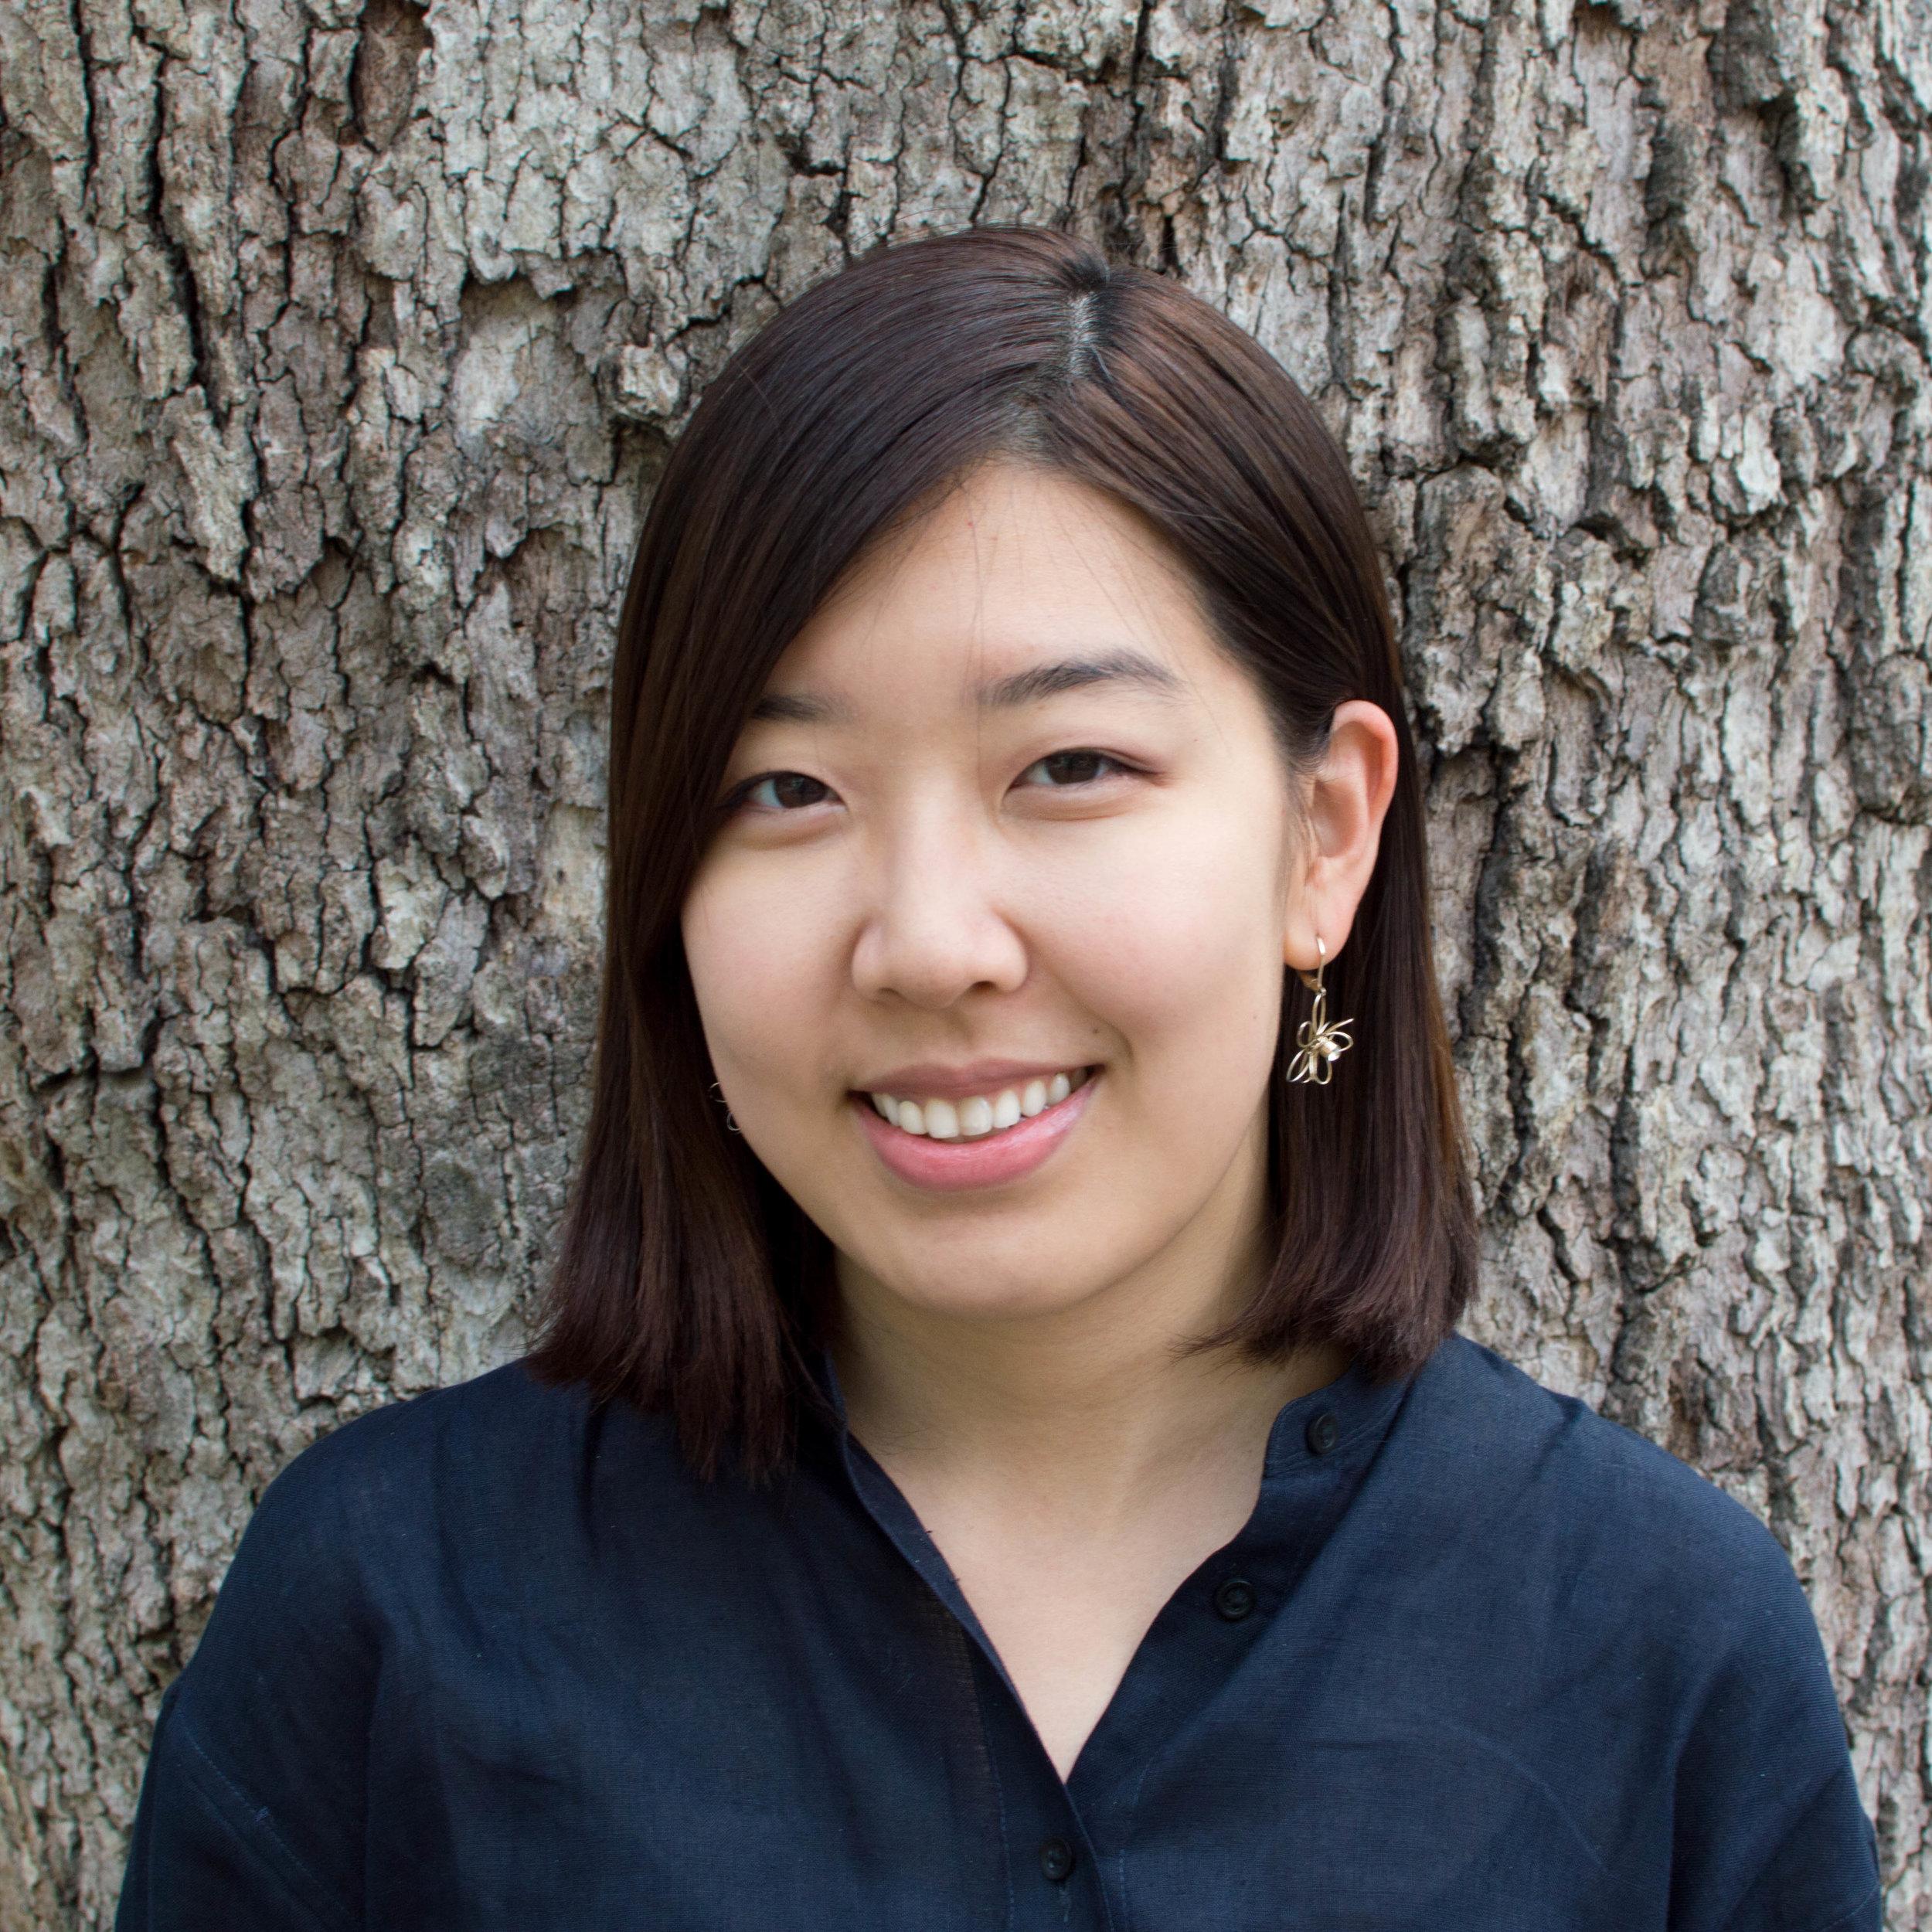 Alexia Kim [G2] - akim2@caltech.edu  B.S. Princeton University 2017 (with Prof. Robert Knowles)